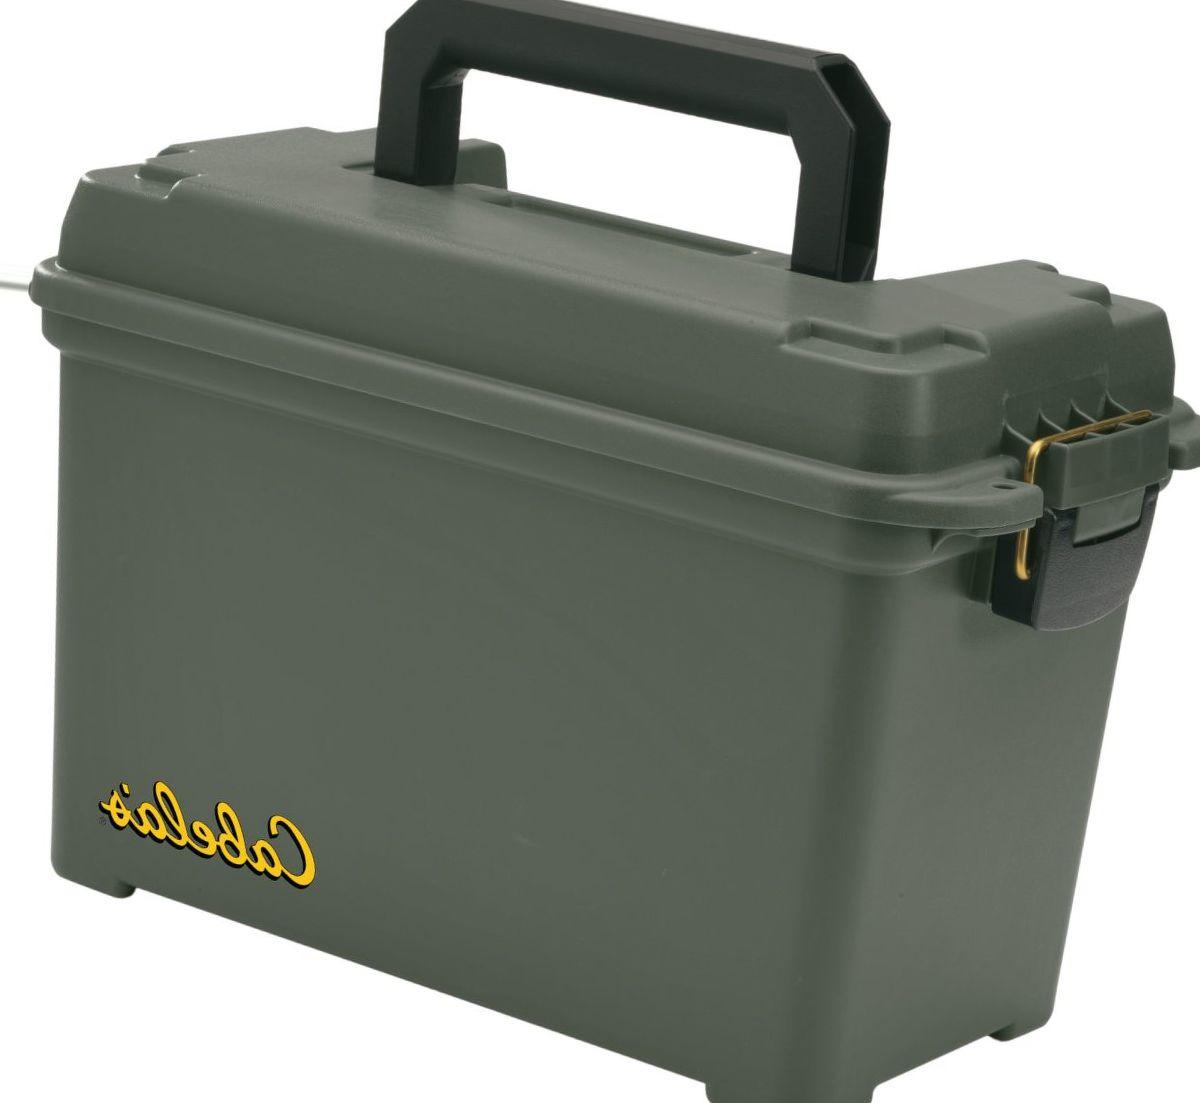 Cabela's Green Dry-Storage Ammunition Box